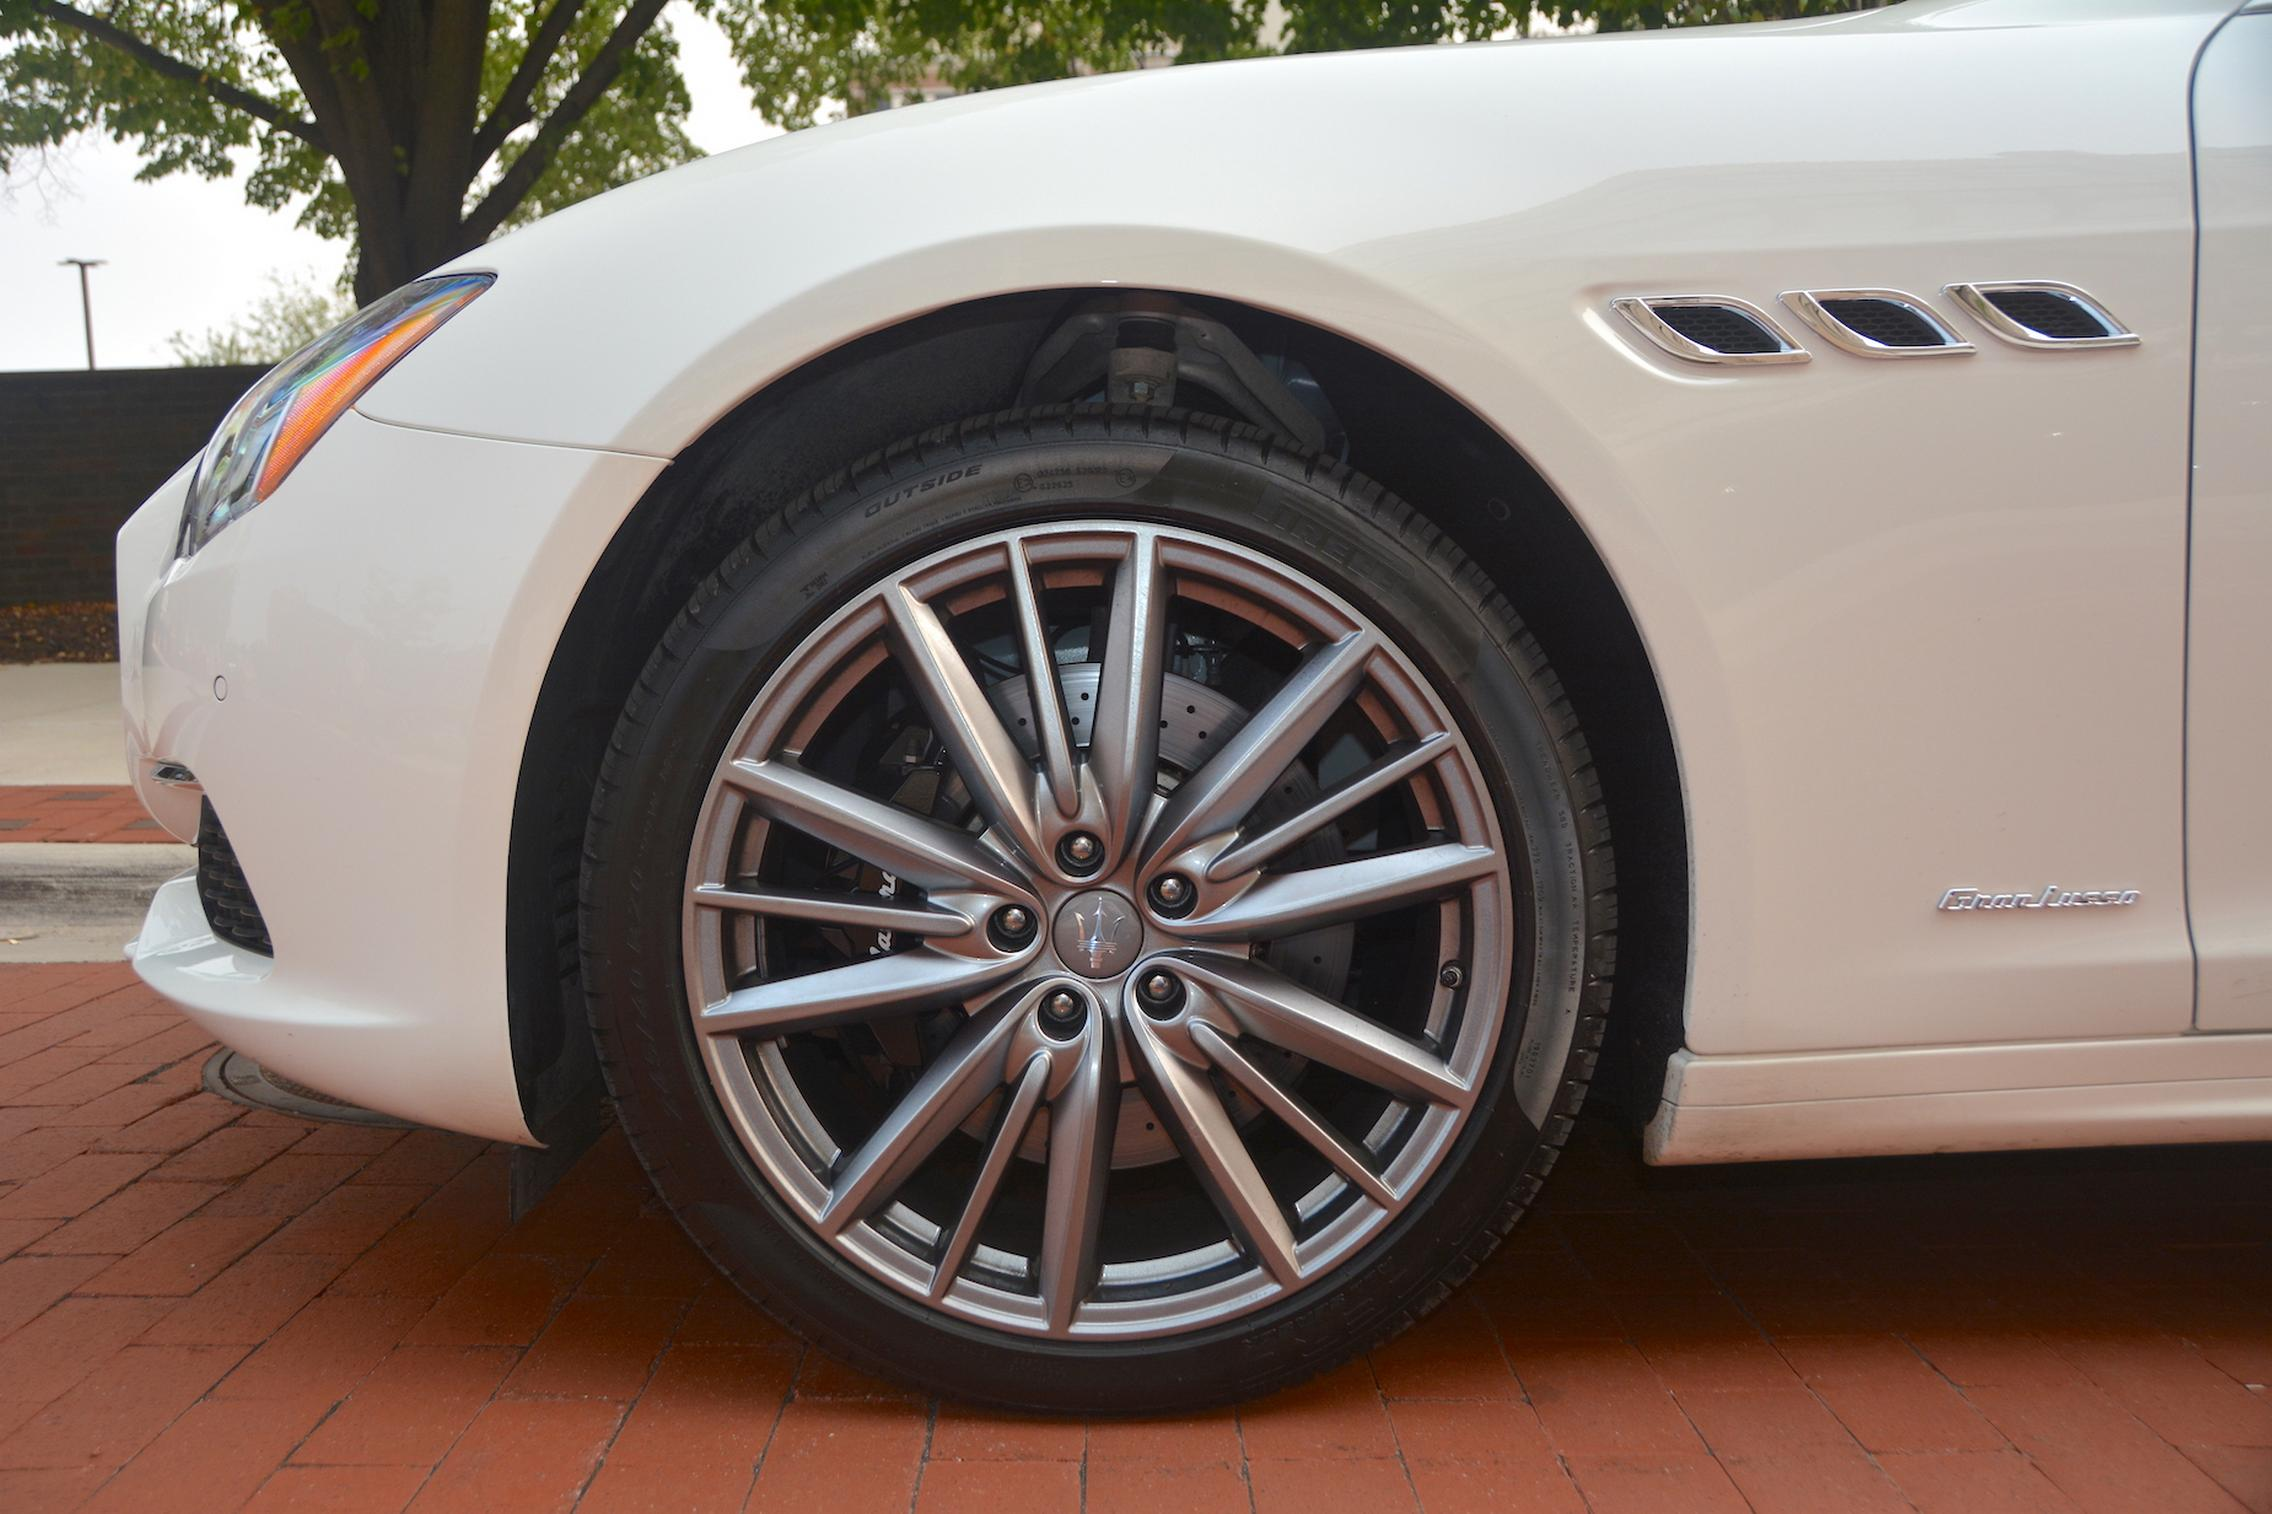 Maserati Quattroporte S Q4 GranLusso Wheels